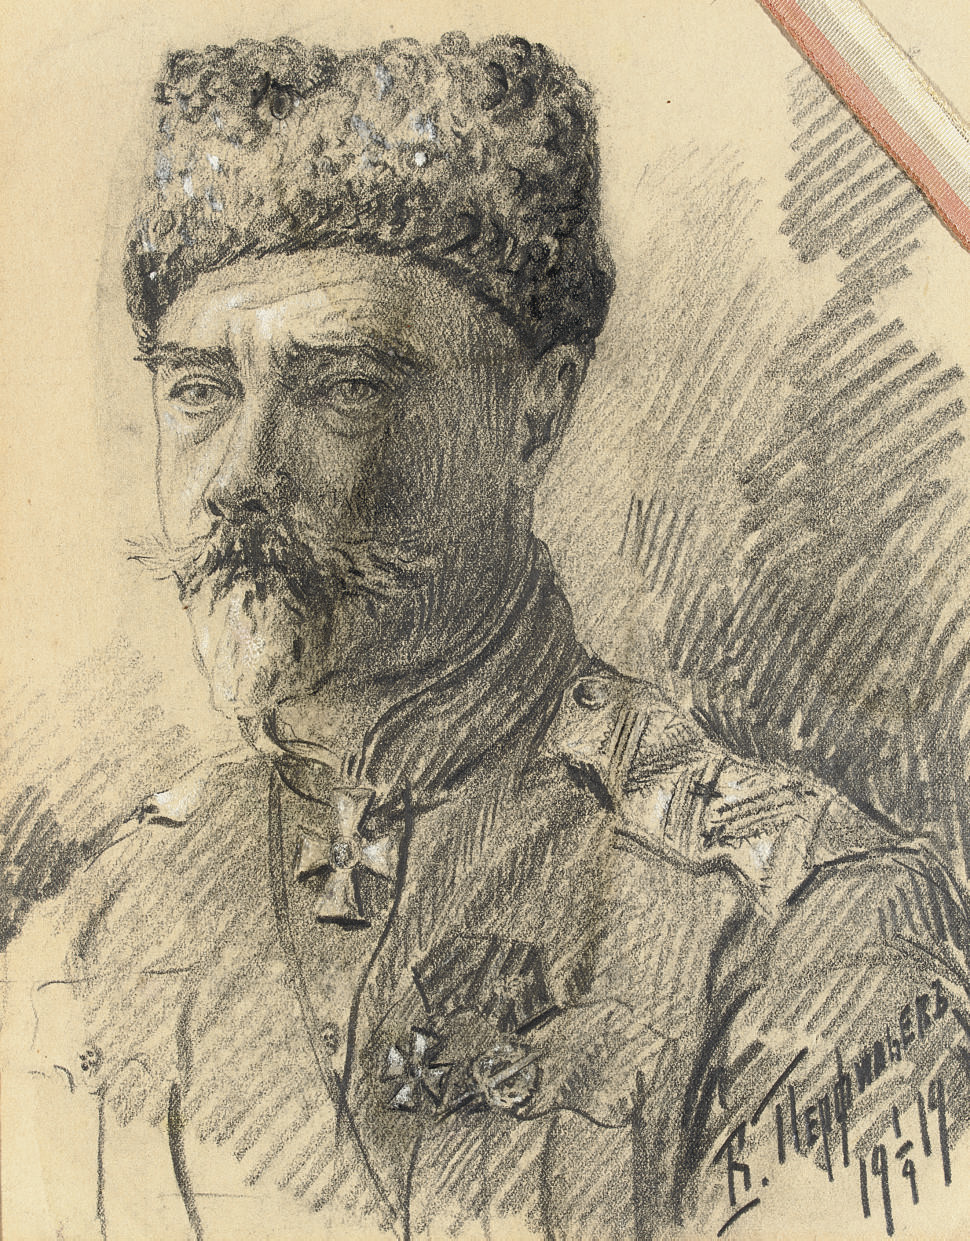 Vladimir Perfiliev (1895-1943)